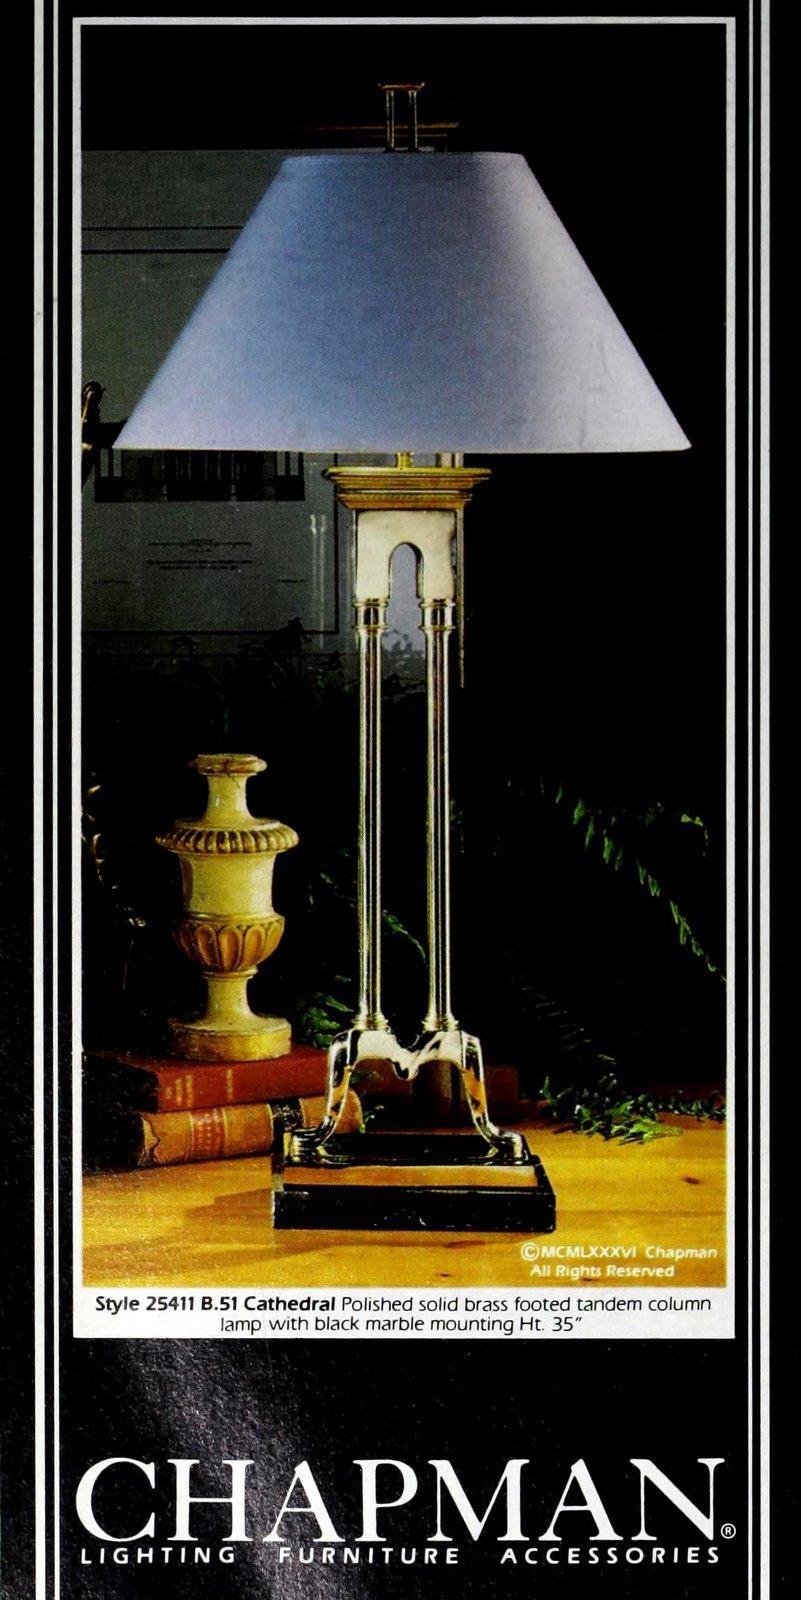 Chapman Cathedral column designer table lamp (1988)